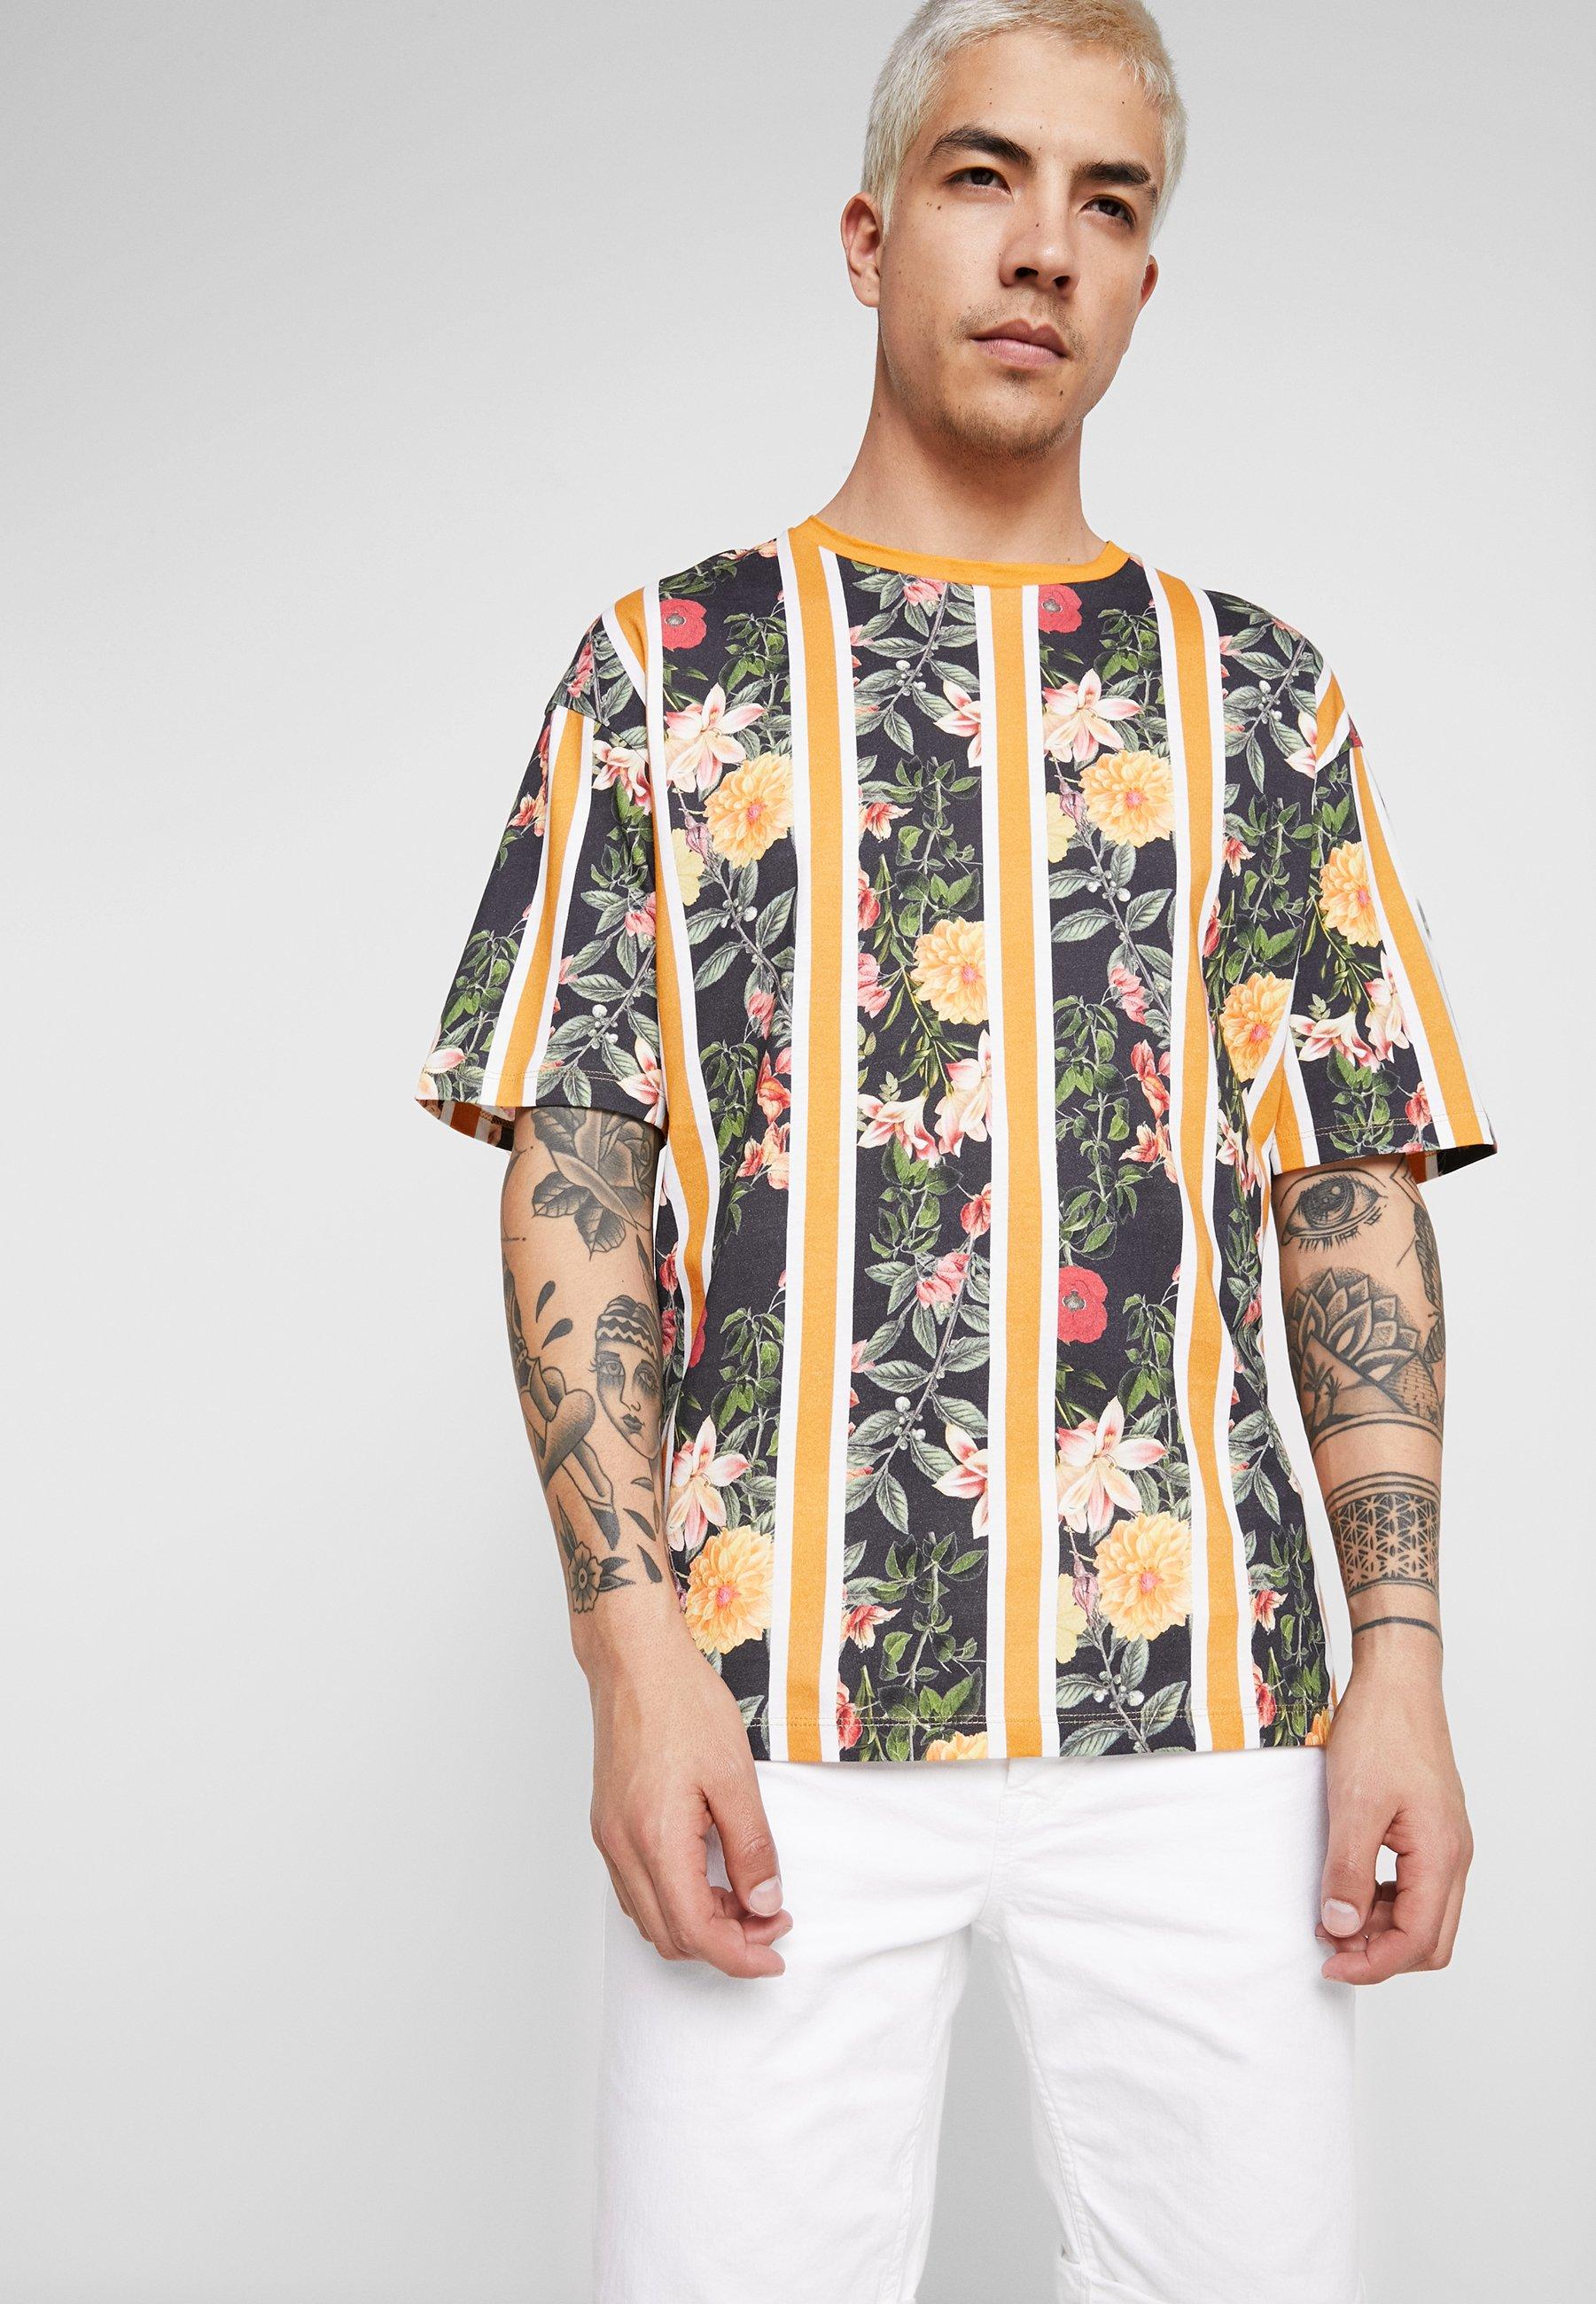 Jones Jorhayan shirt Sunflower Tee Imprimé Crew Jackamp; NeckT ARLj34q5